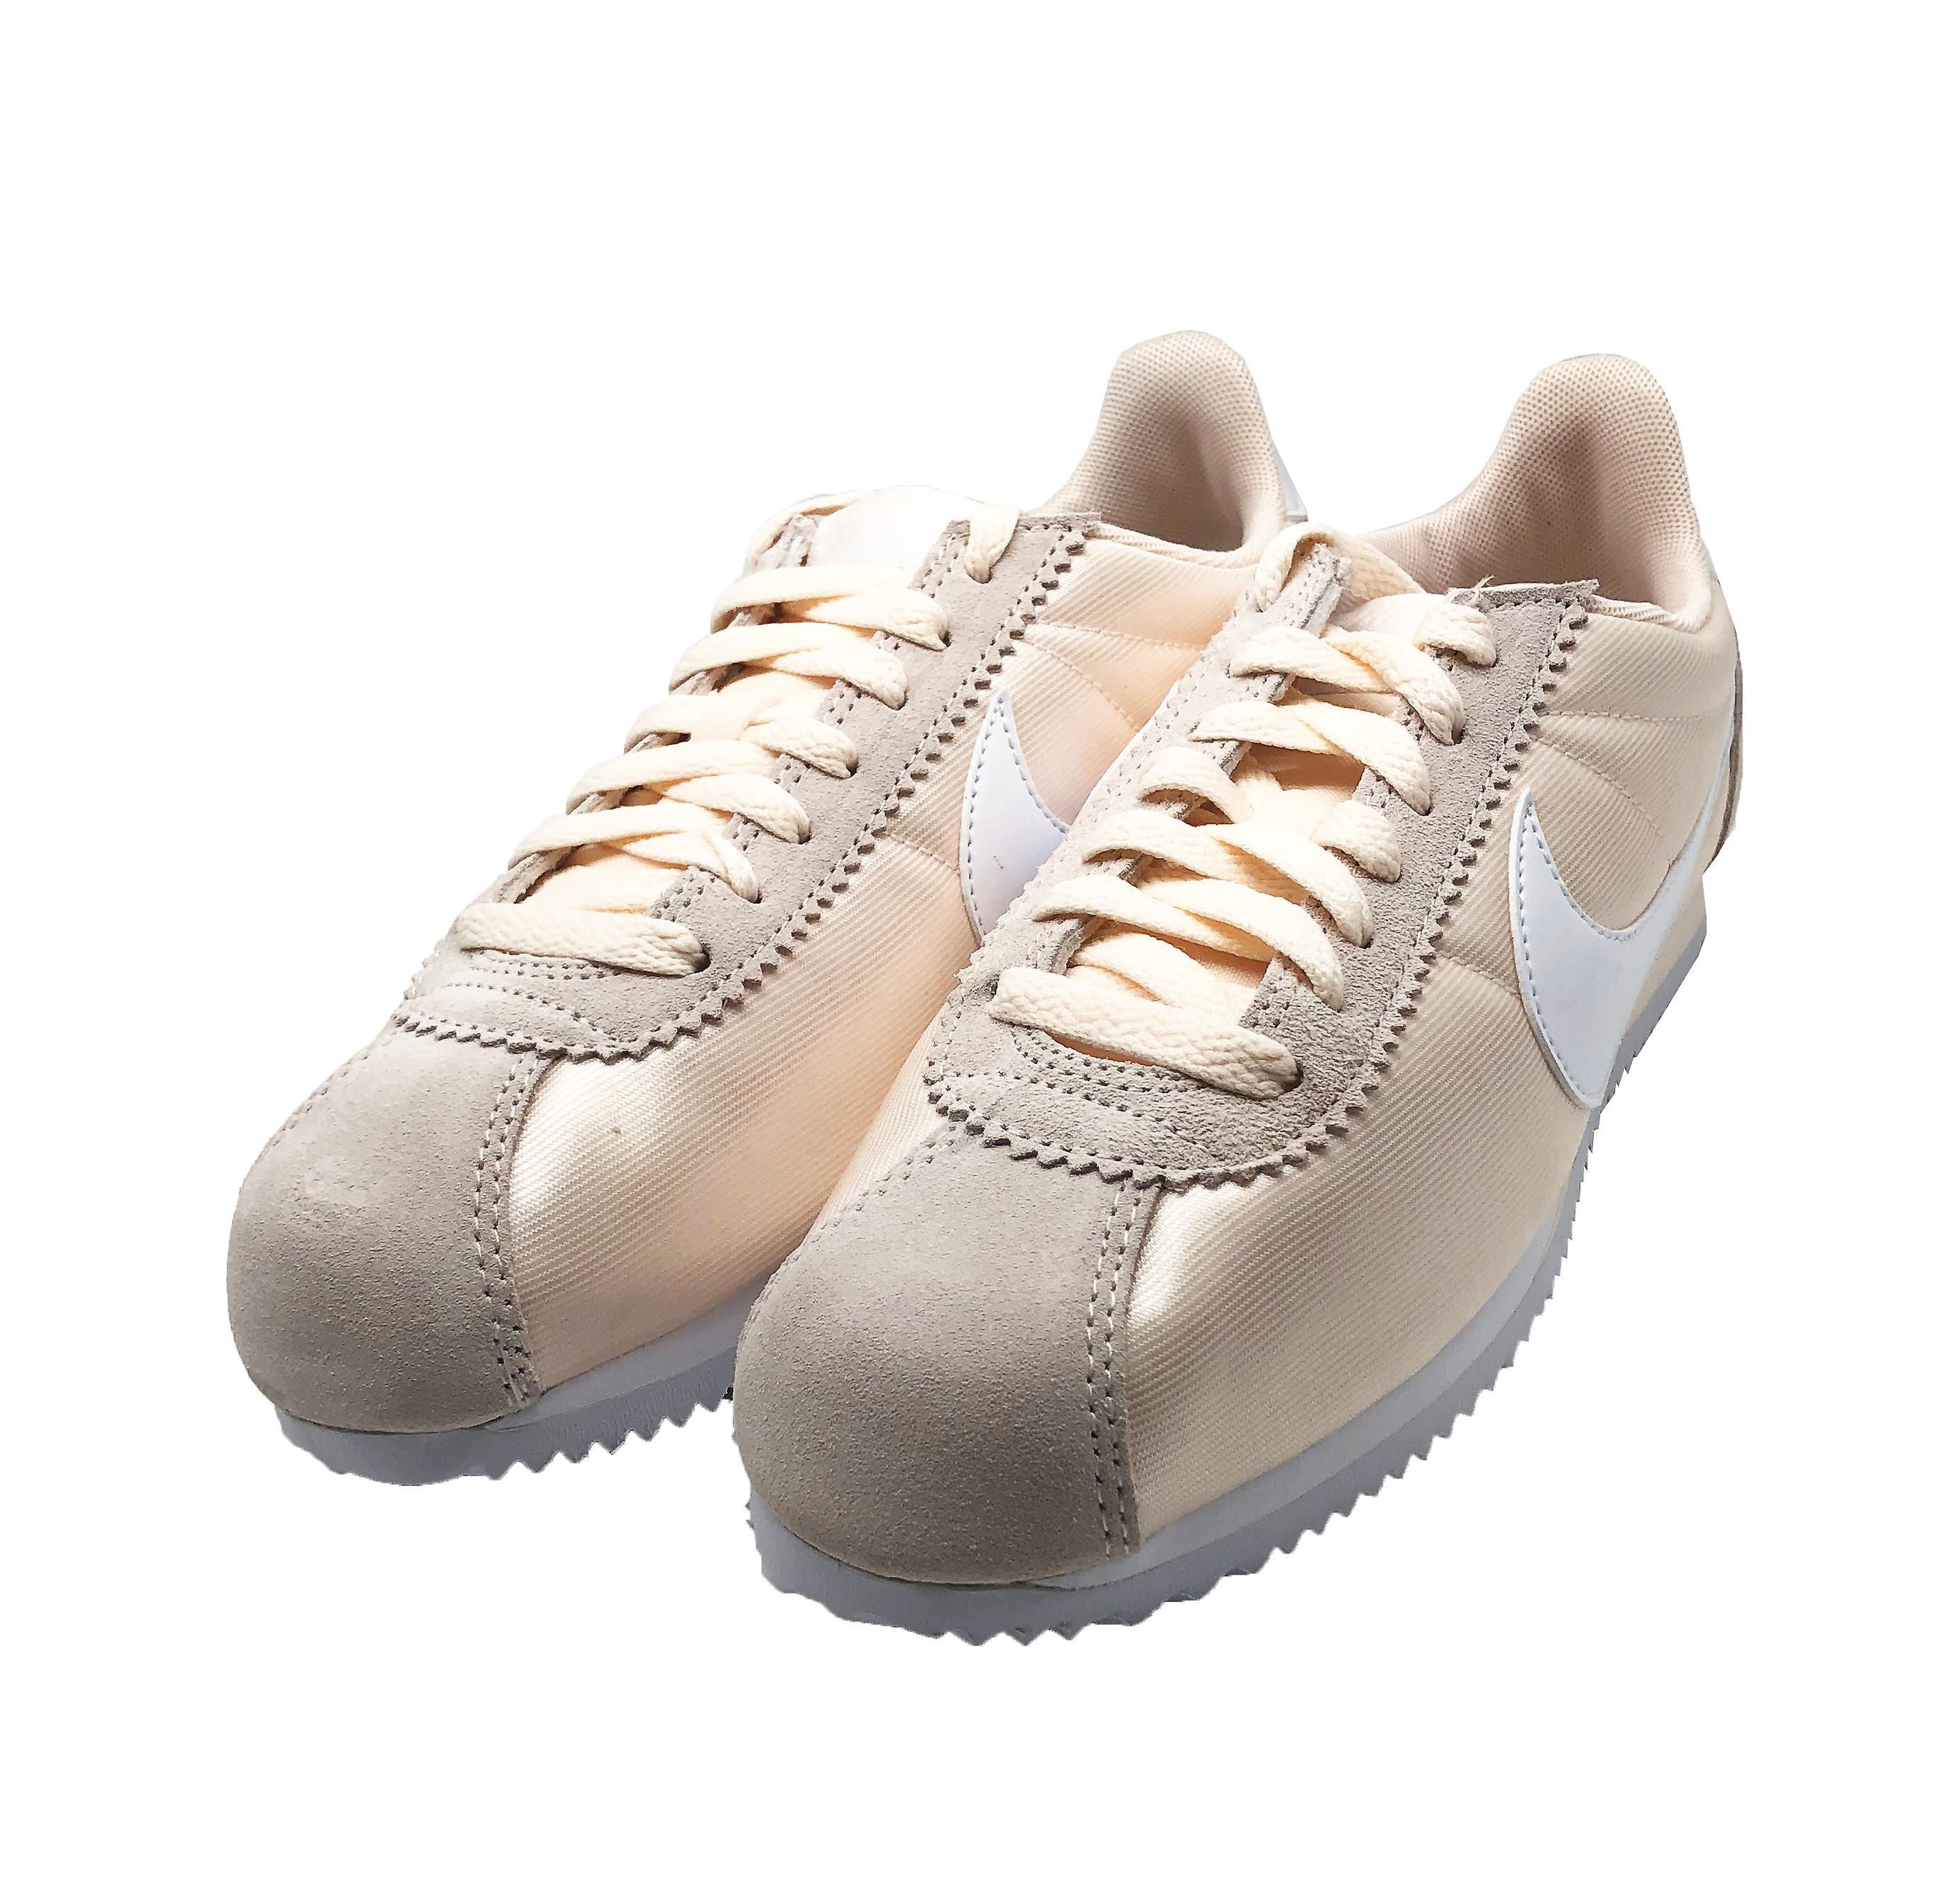 Nike Classic Cortez Nylon 749864 803 Womens Trainers